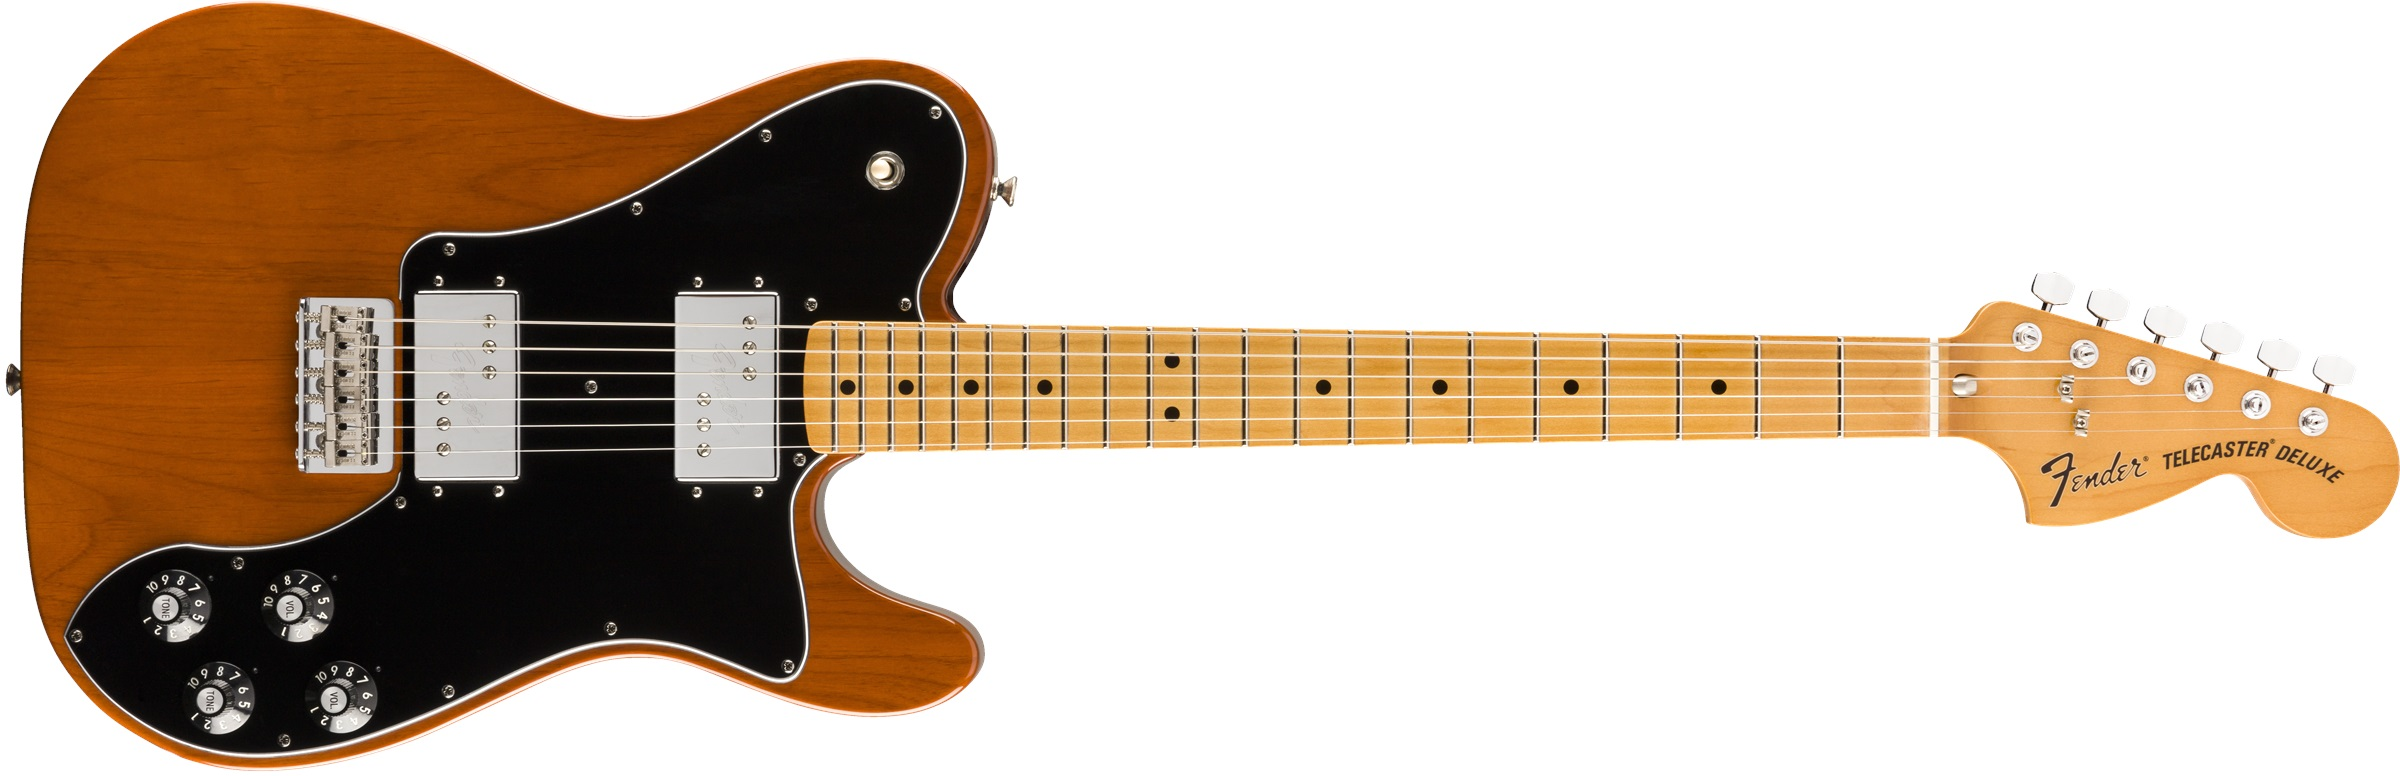 Fender Vintera 70s Telecaster Deluxe MN MO